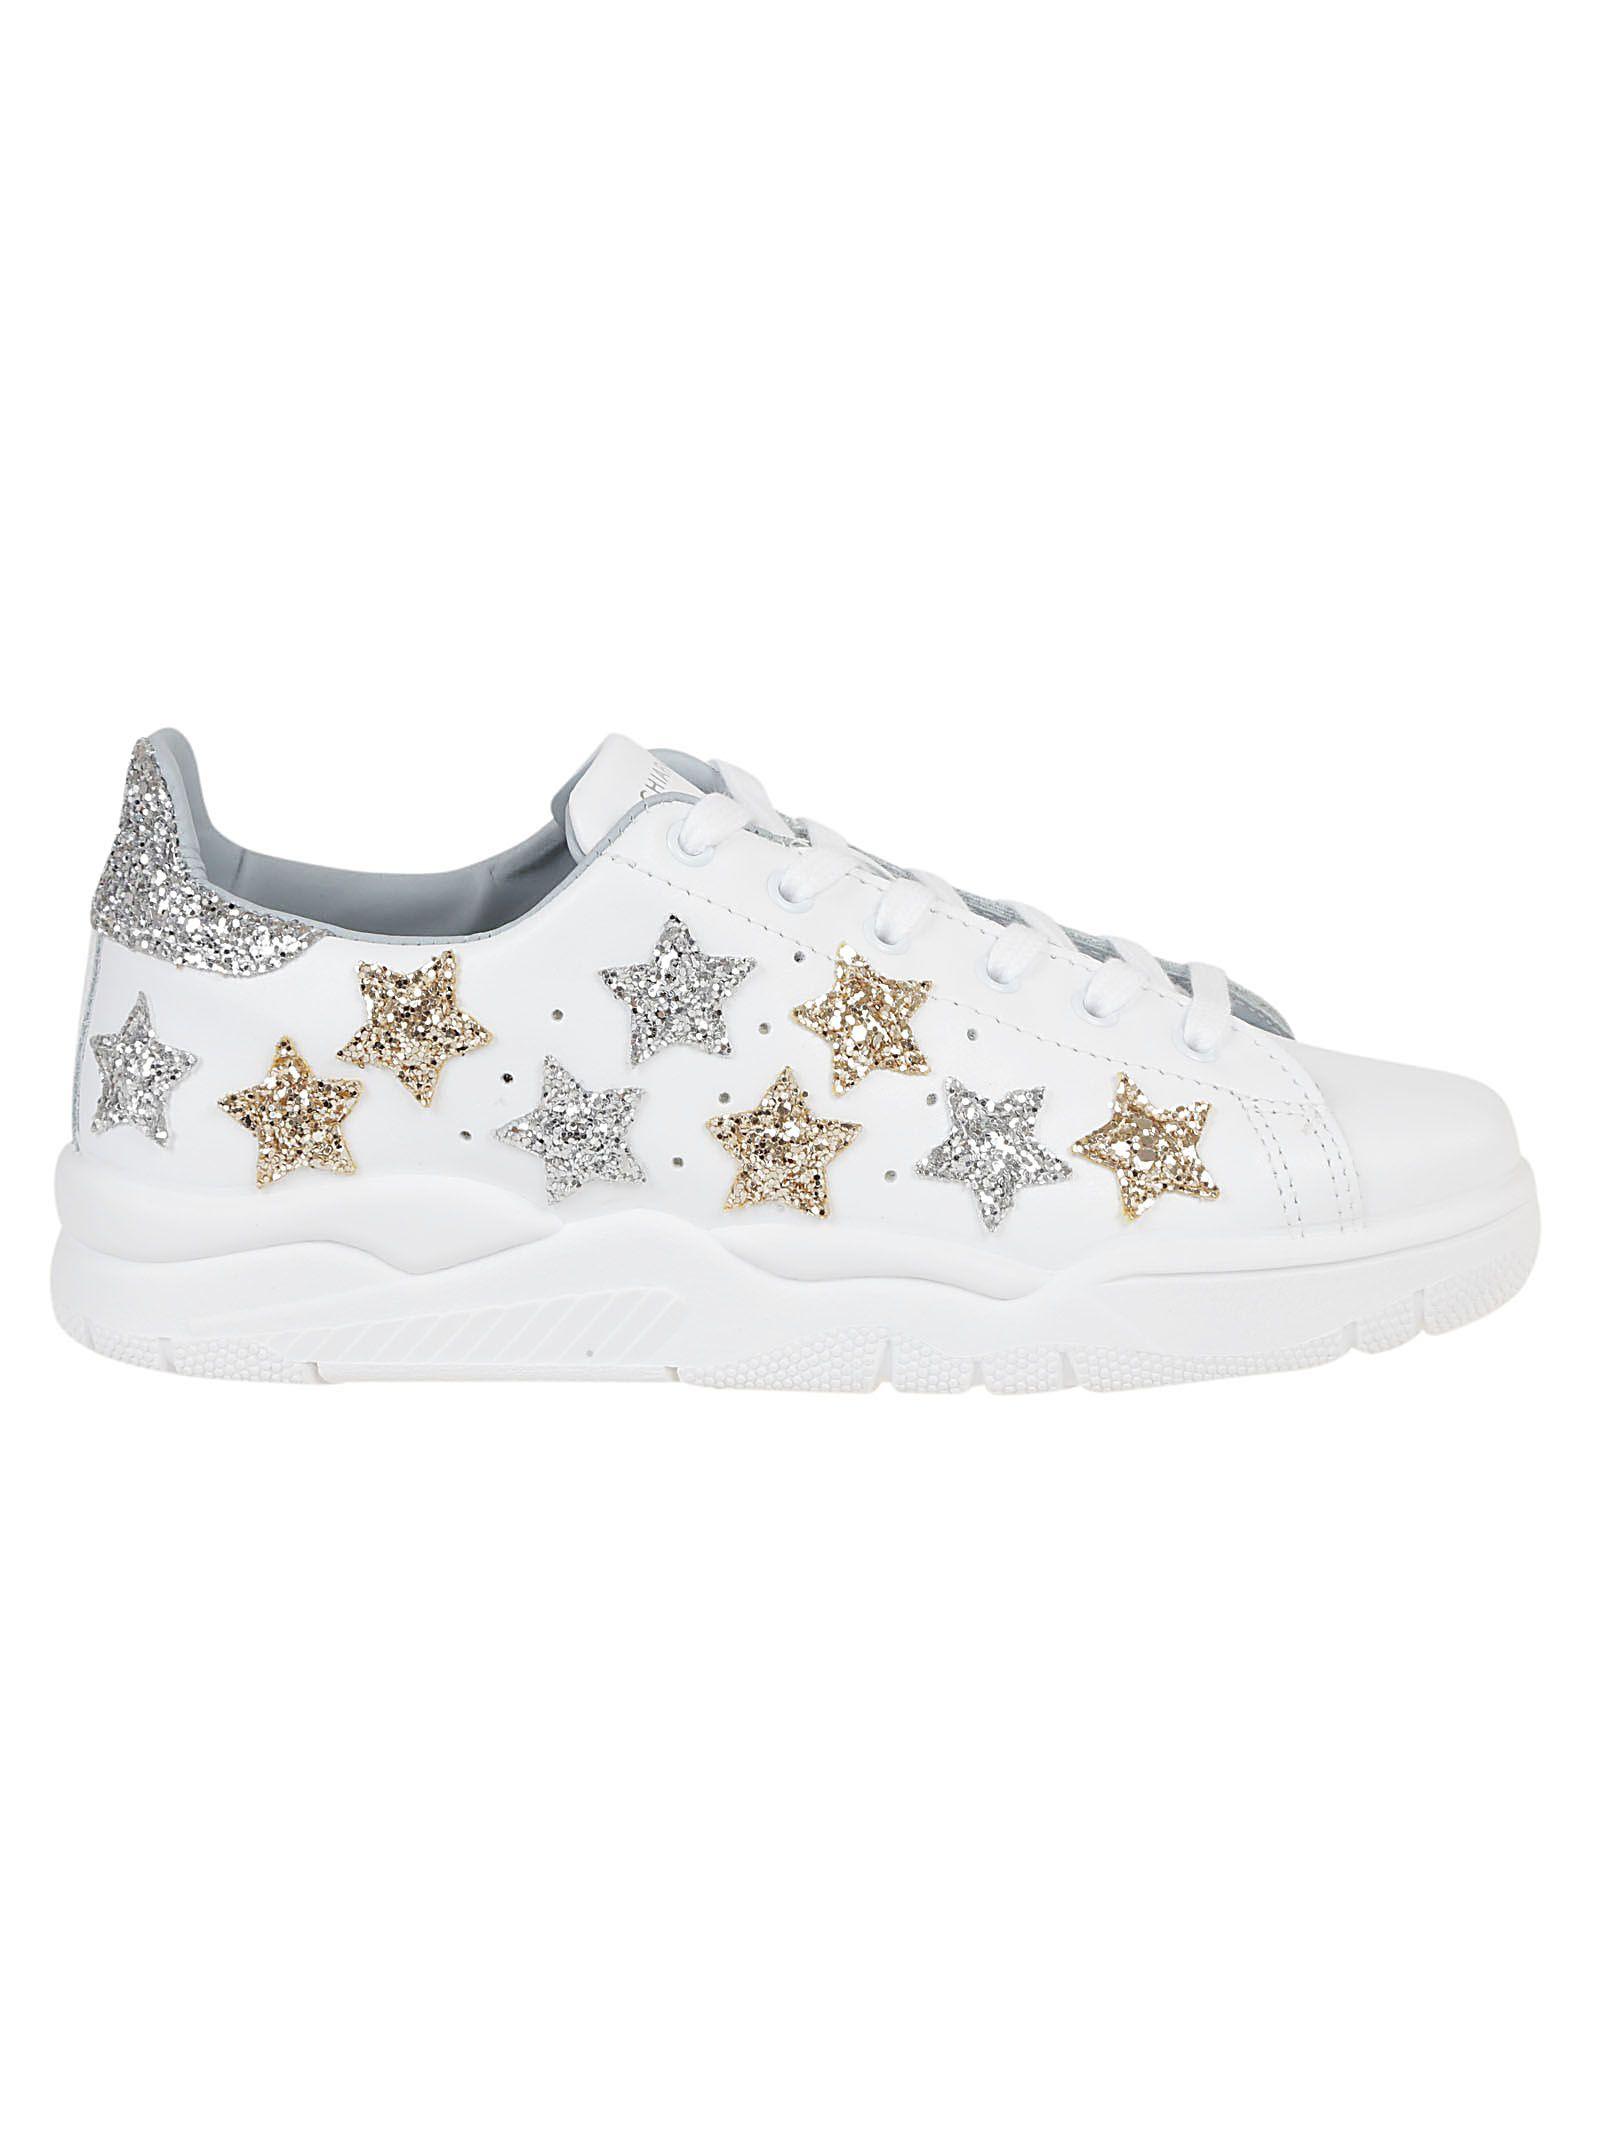 Chiara Ferragni Star Glitter Sneakers